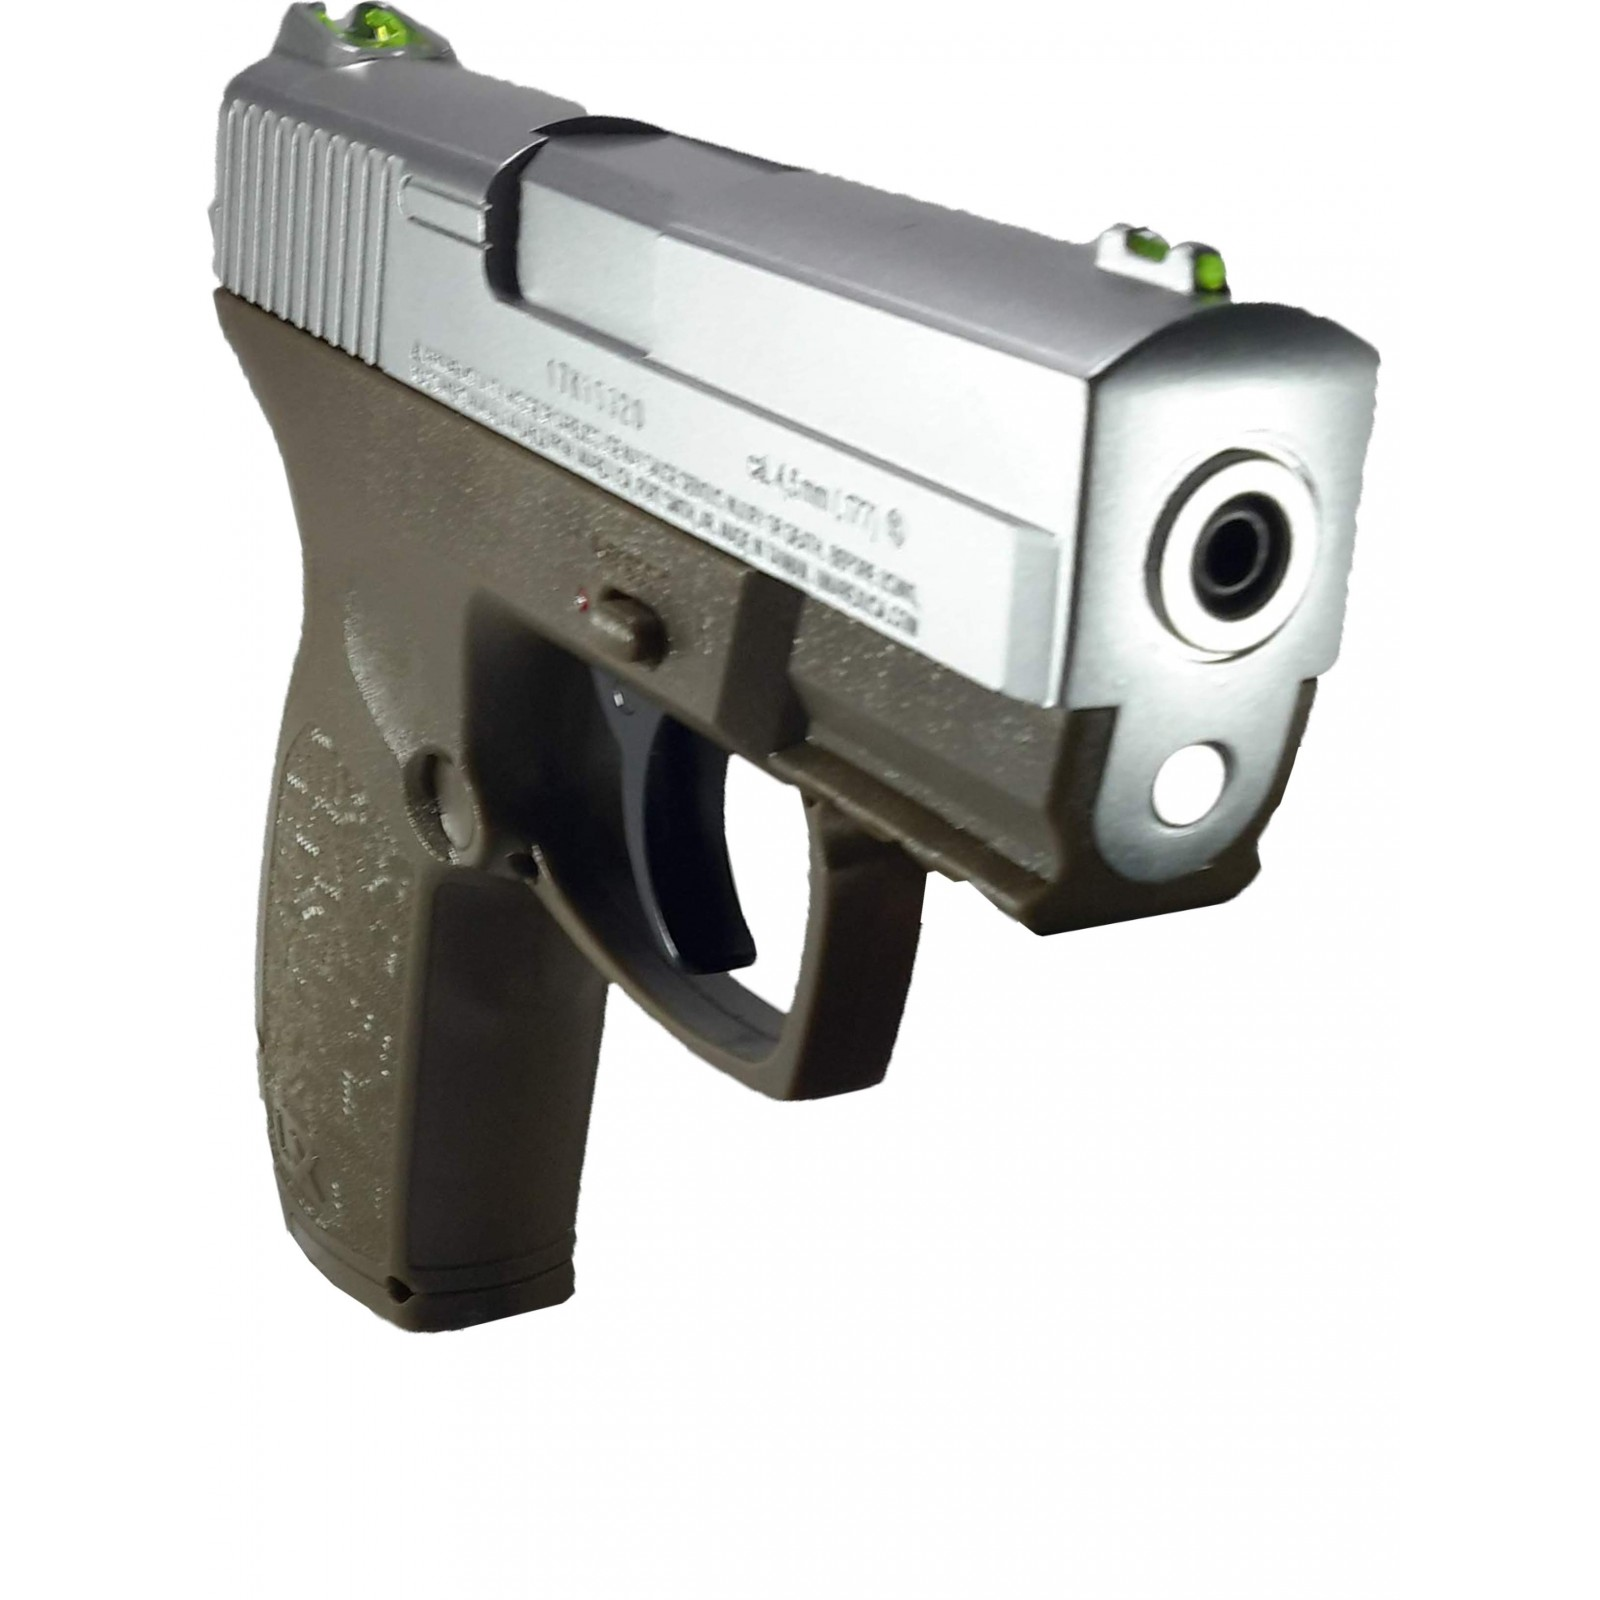 Pistola CO2 Ux Umarex XCP Balin 4,5 mm Cañón Abierto